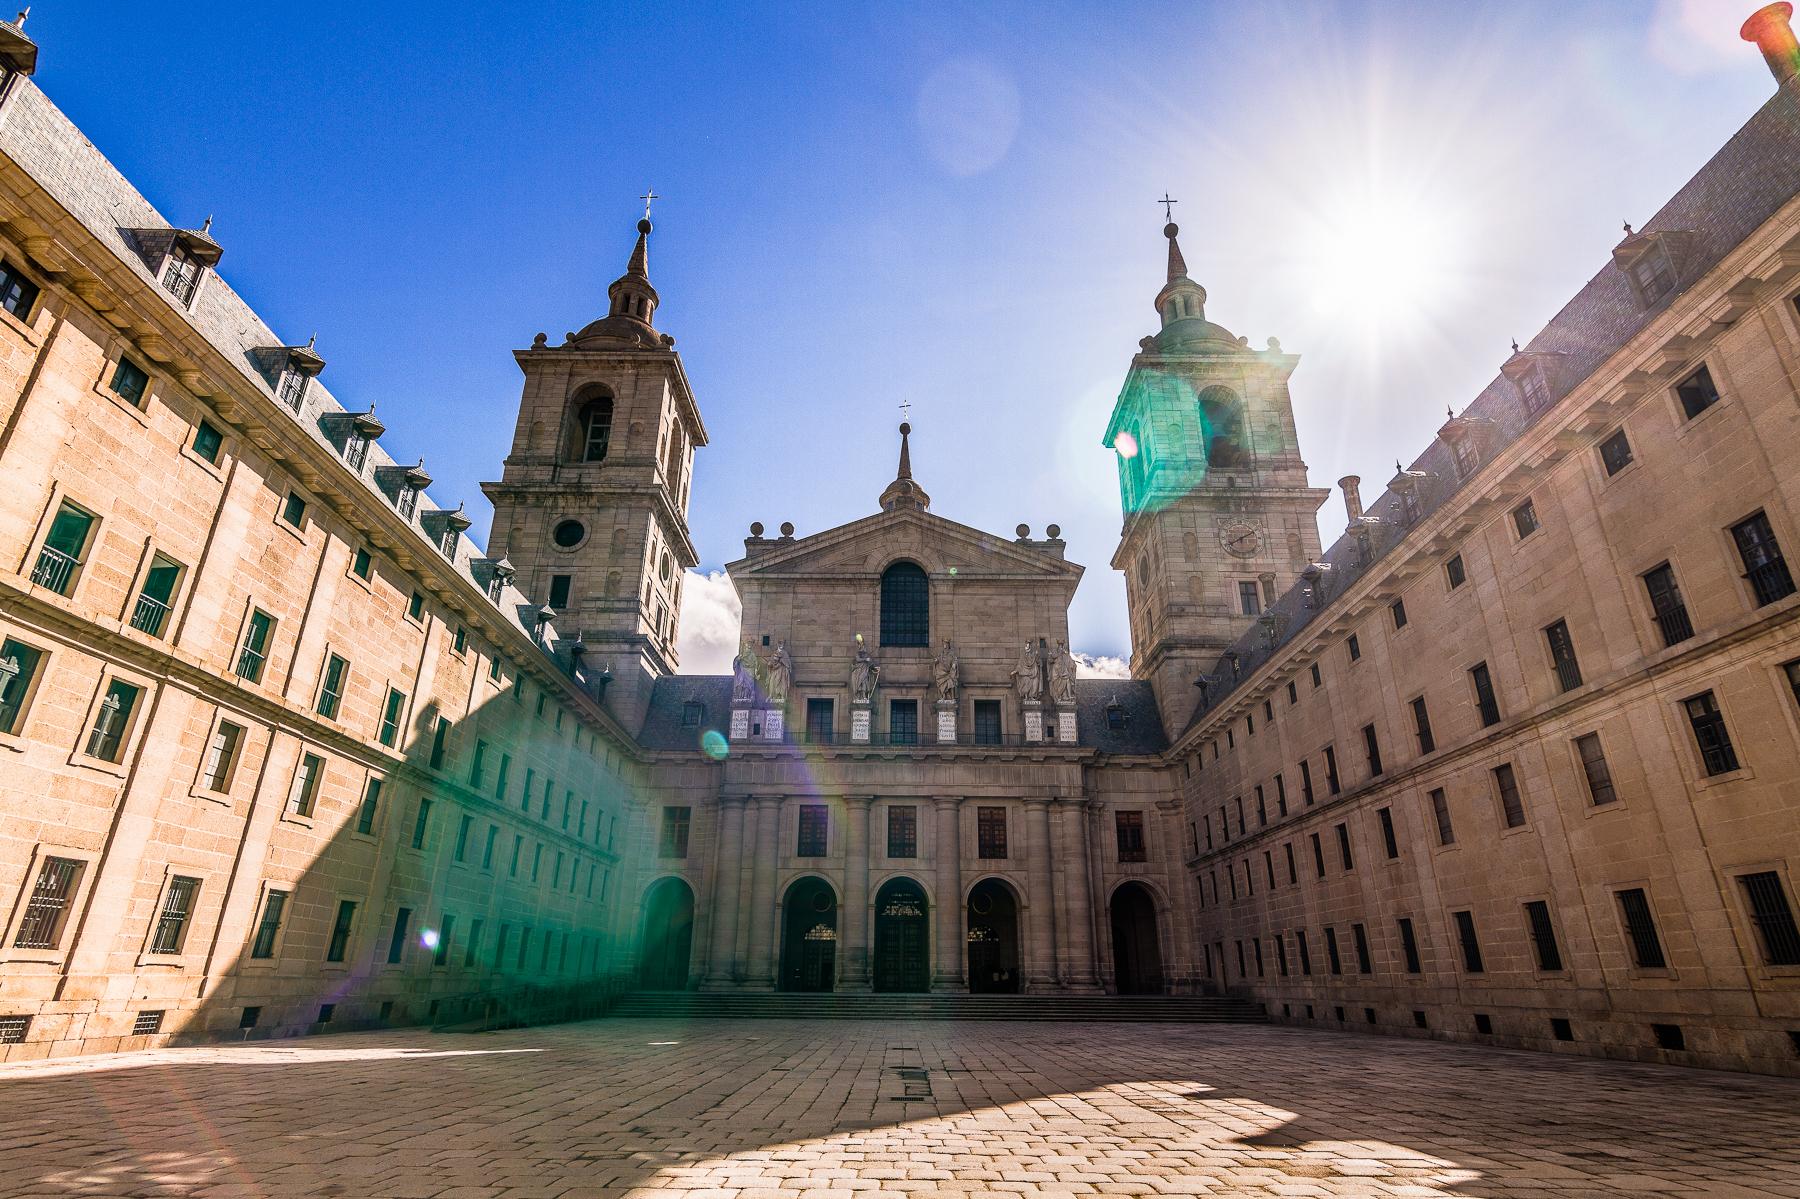 Real Monasterio de San Lorenzo de El Escorial, España.